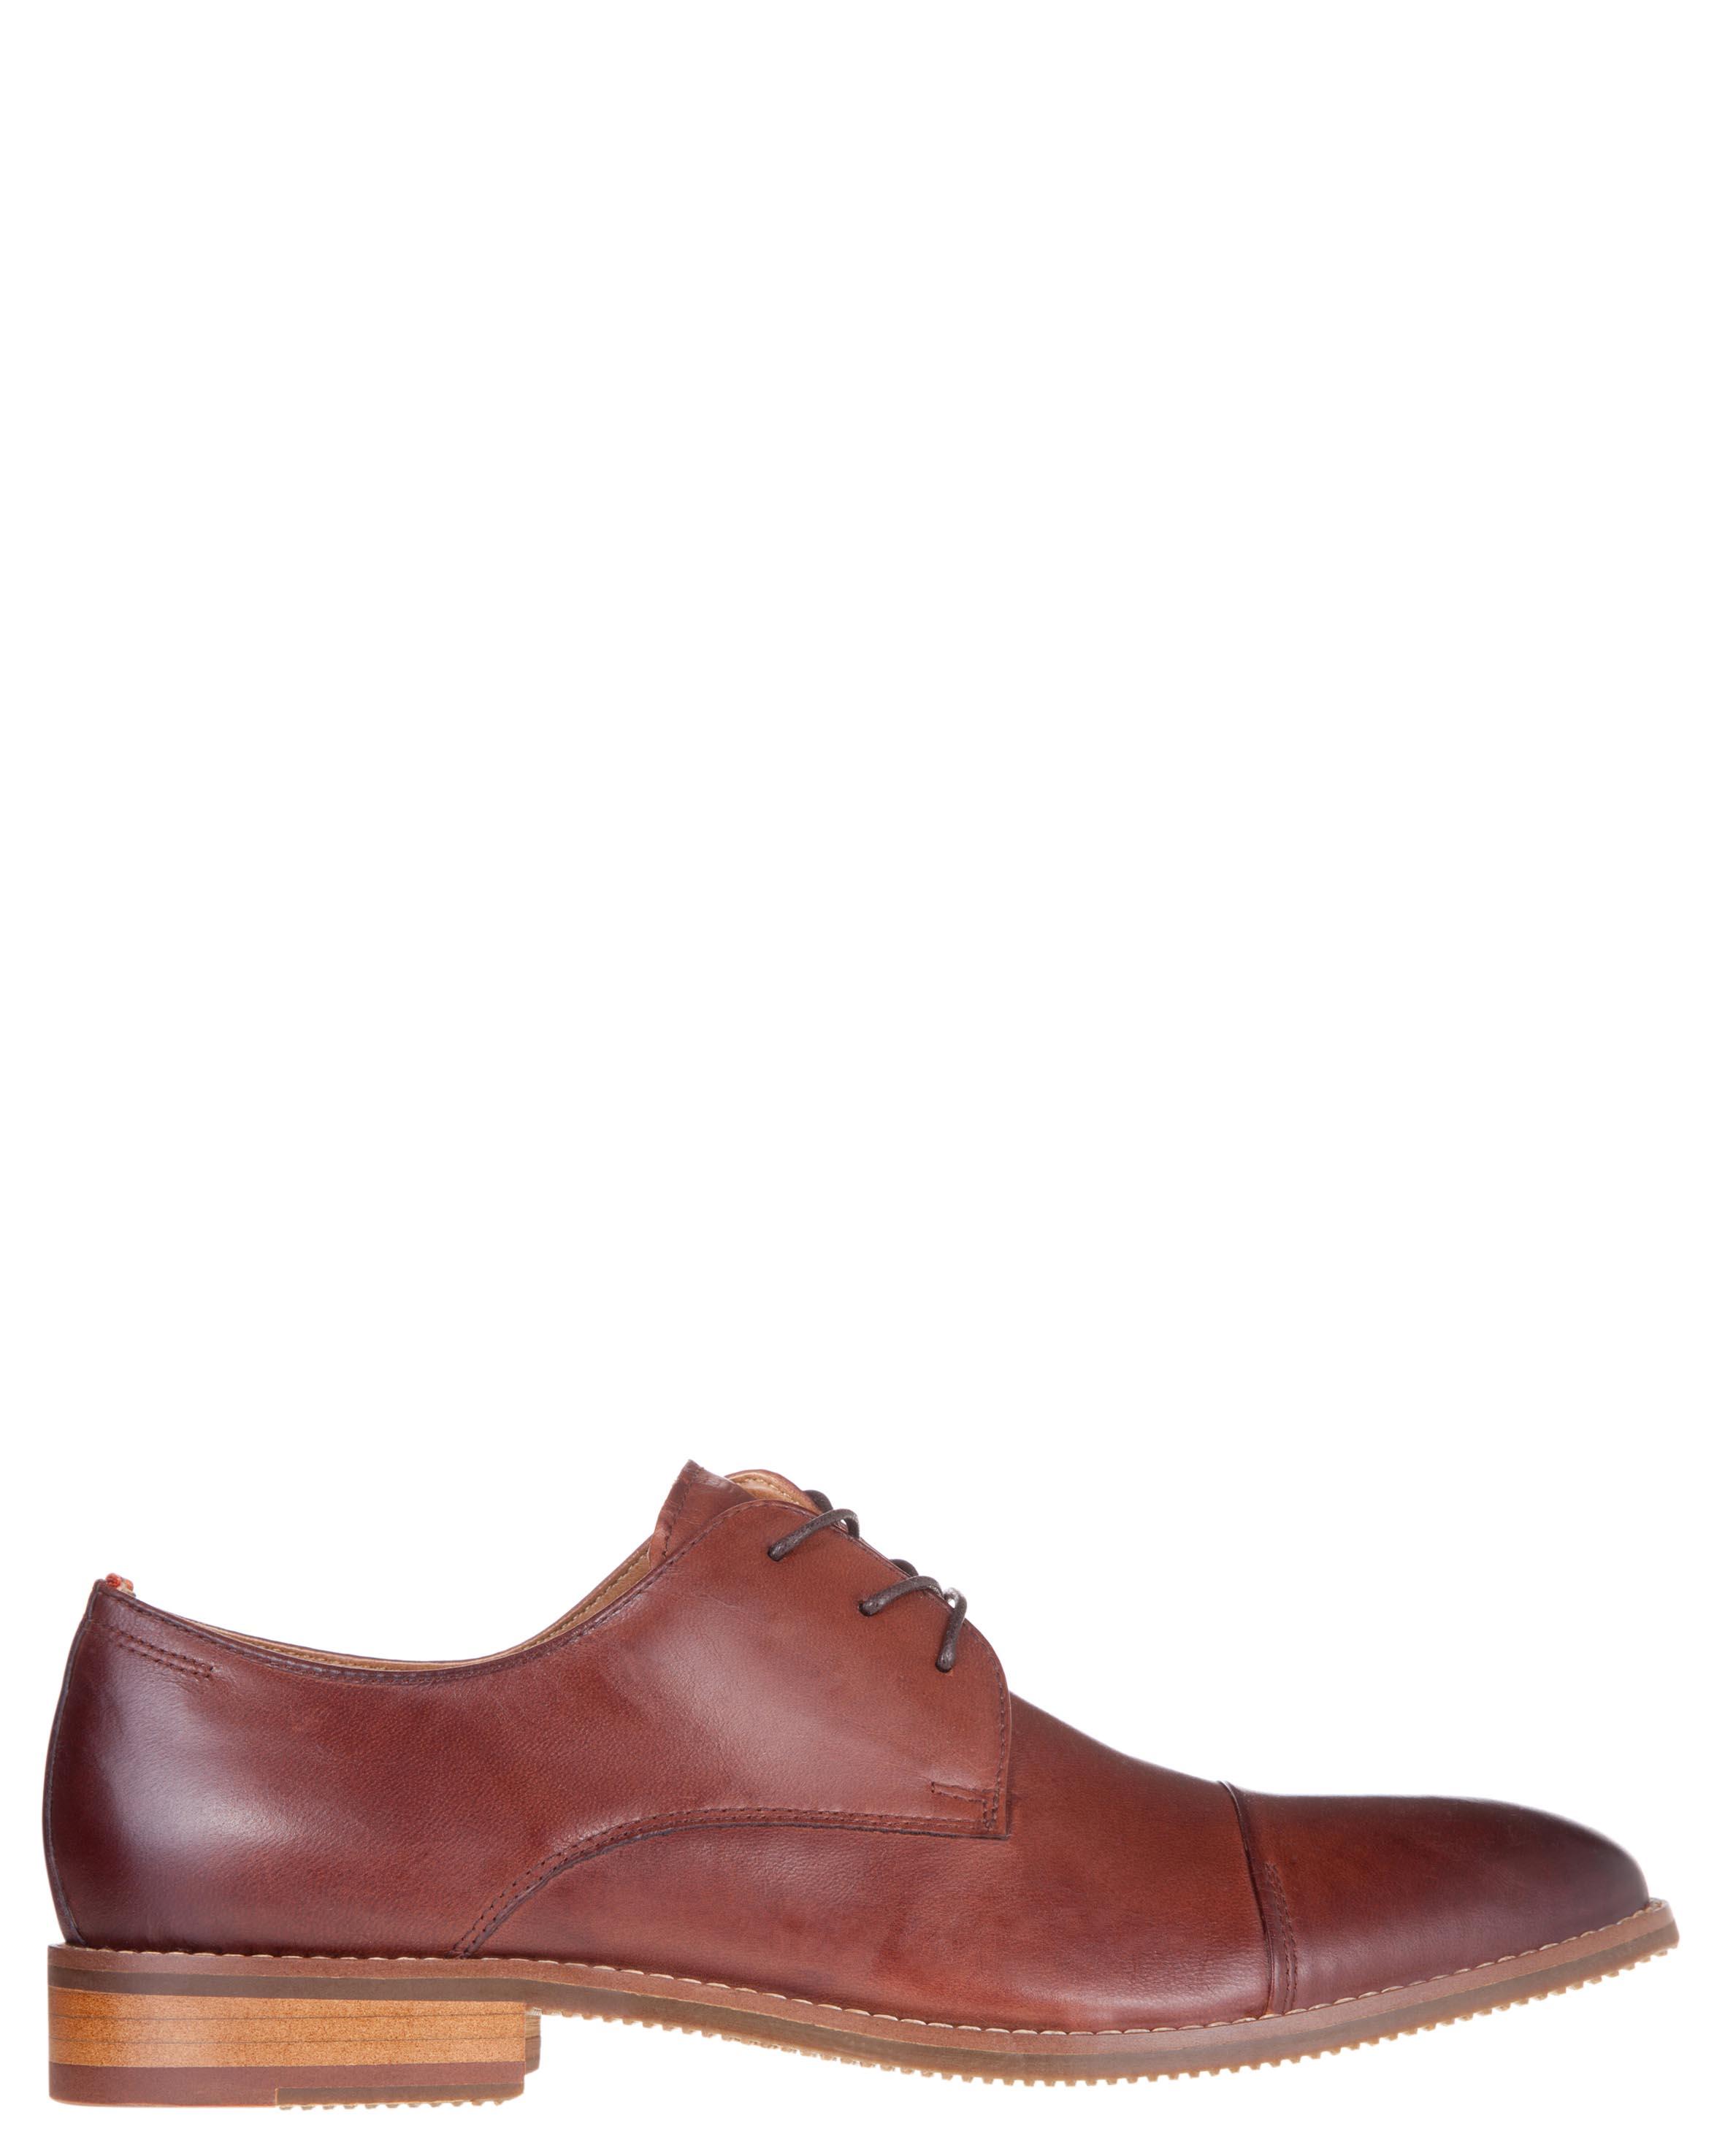 Dress Shoes for Men | Shop Dress Shoes Online from